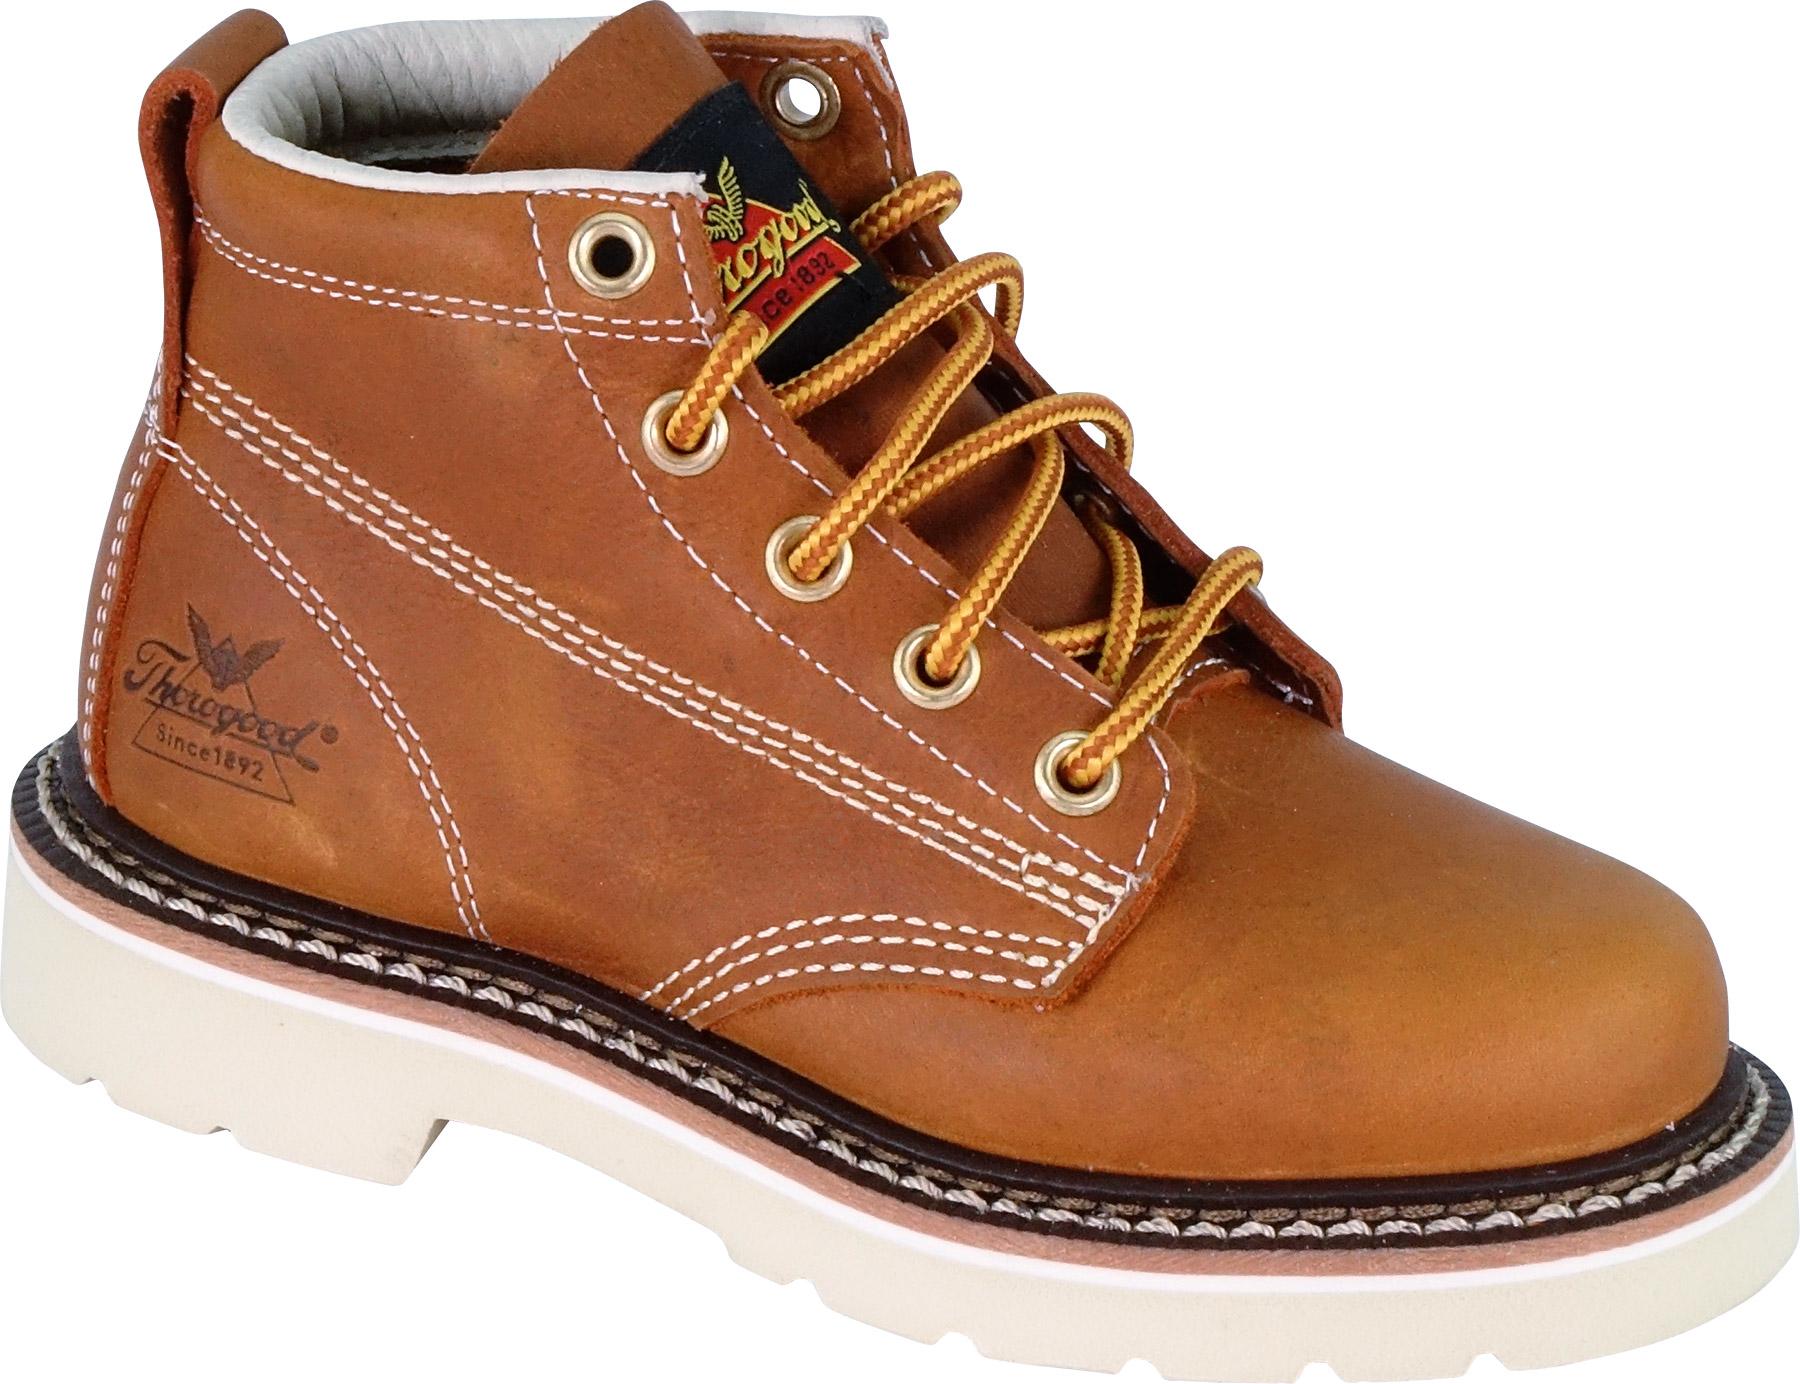 283cf7c2107 Weinbrenner Shoe Company / Thorogood Shoes